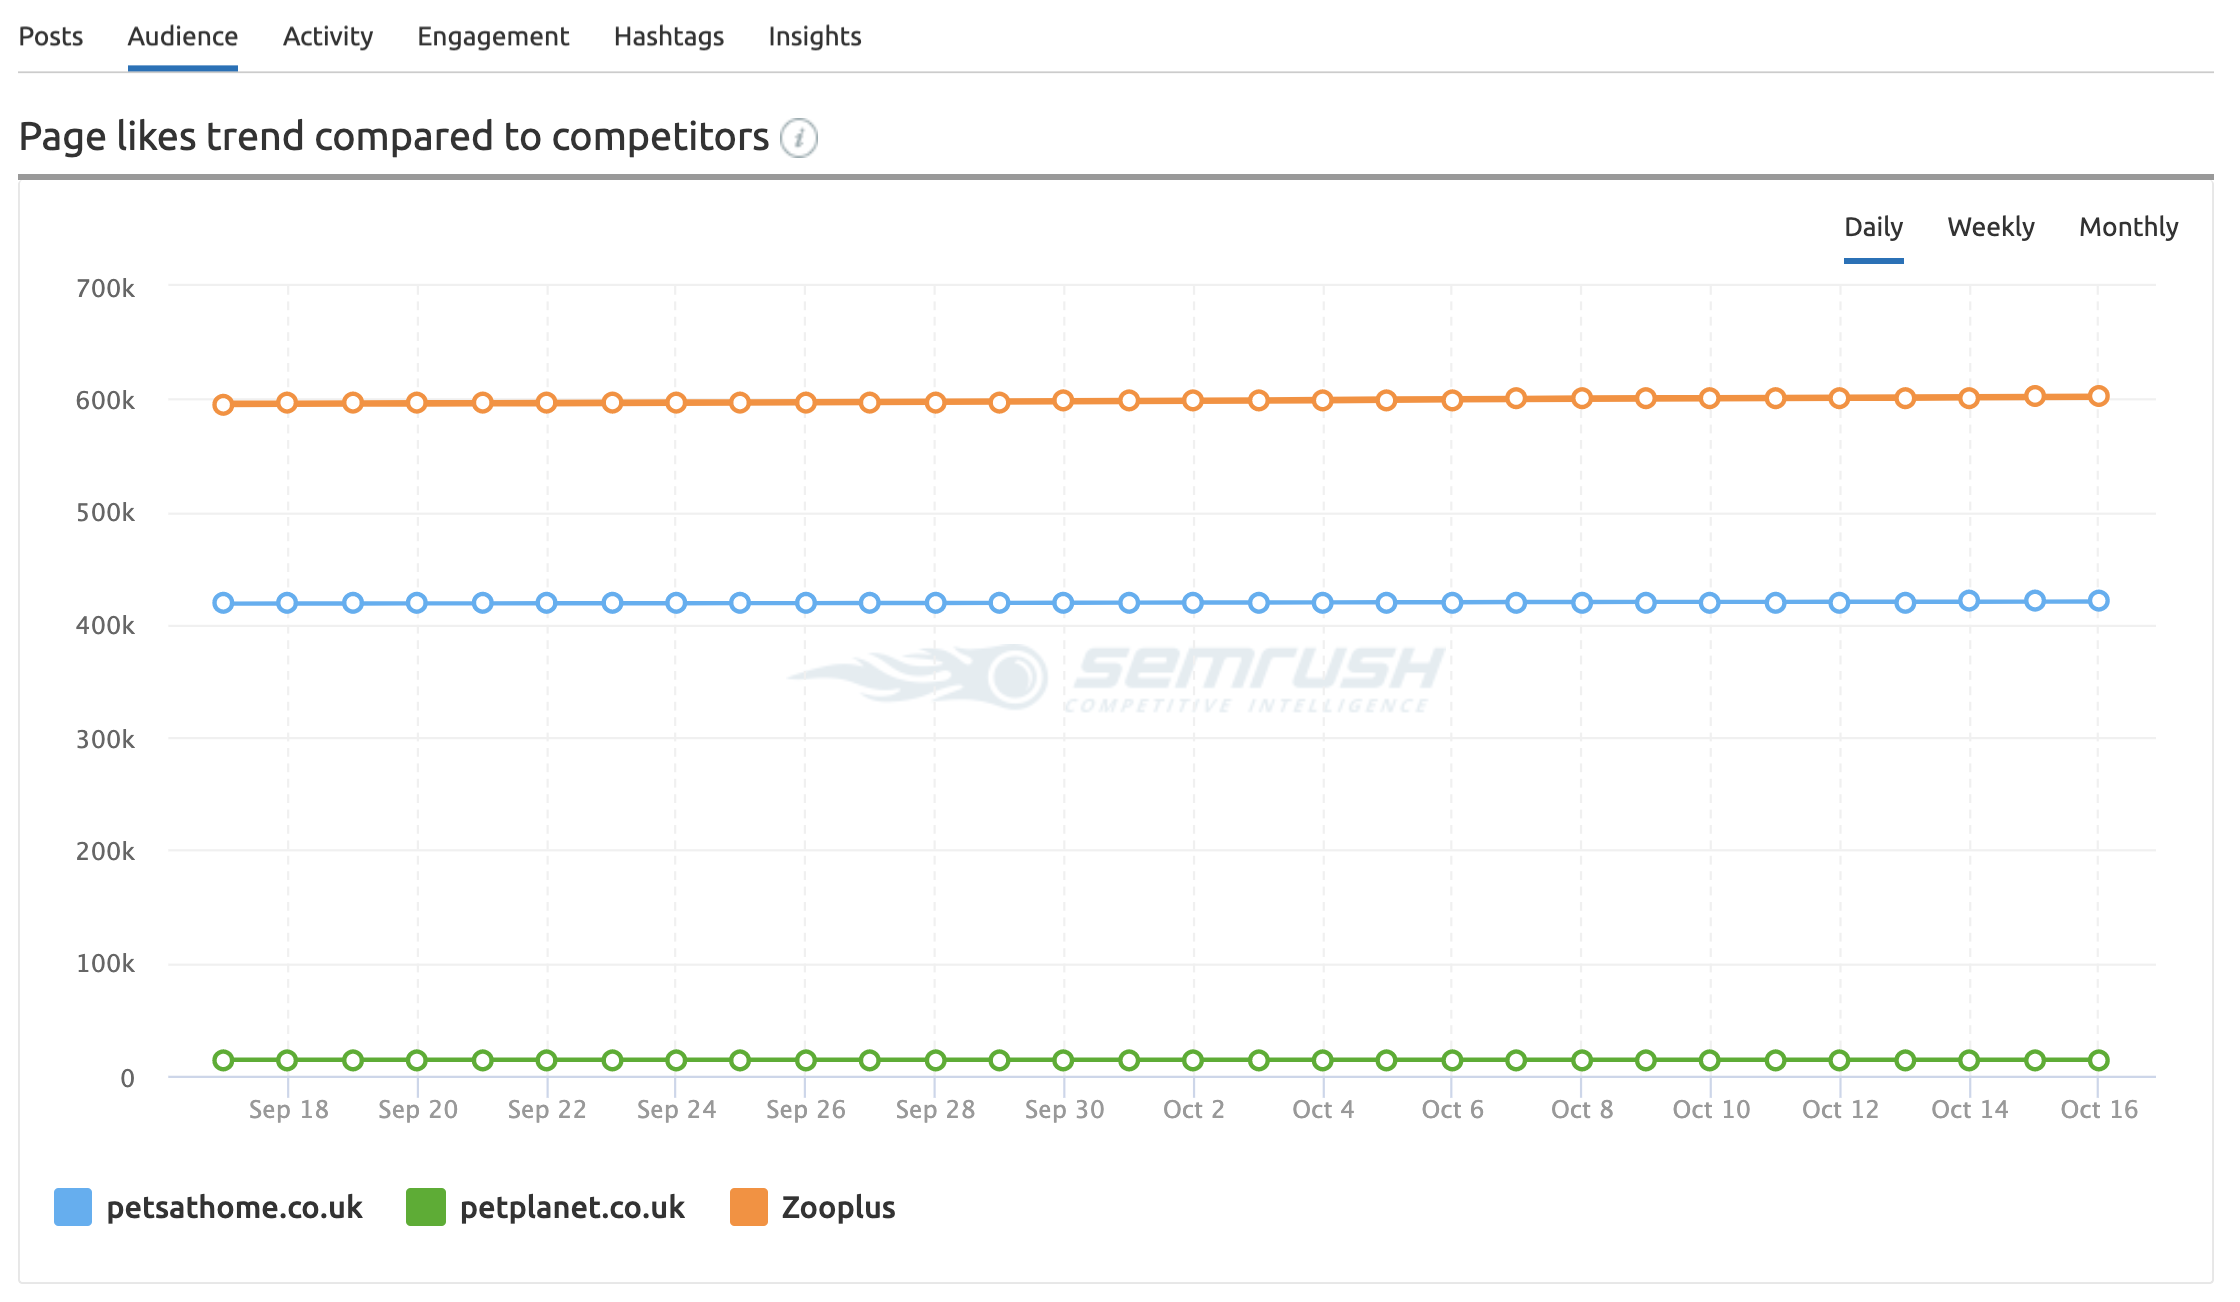 semrush page likes trend tracker